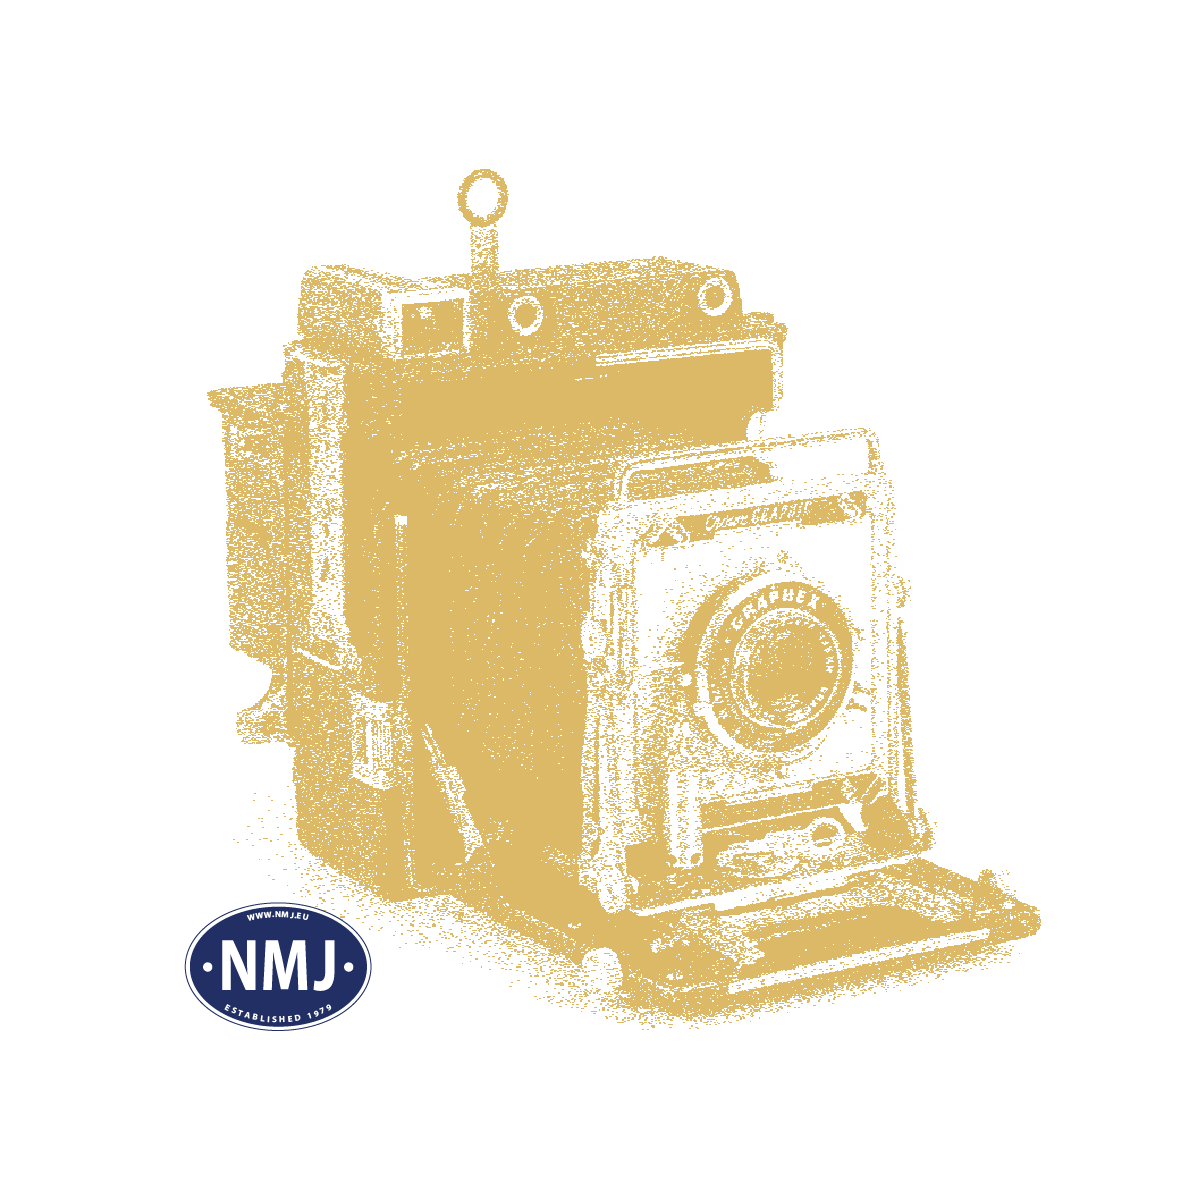 NMJKAT19 - NMJ Neuheiten Katalog 2019, Superline, Topline, Skyline